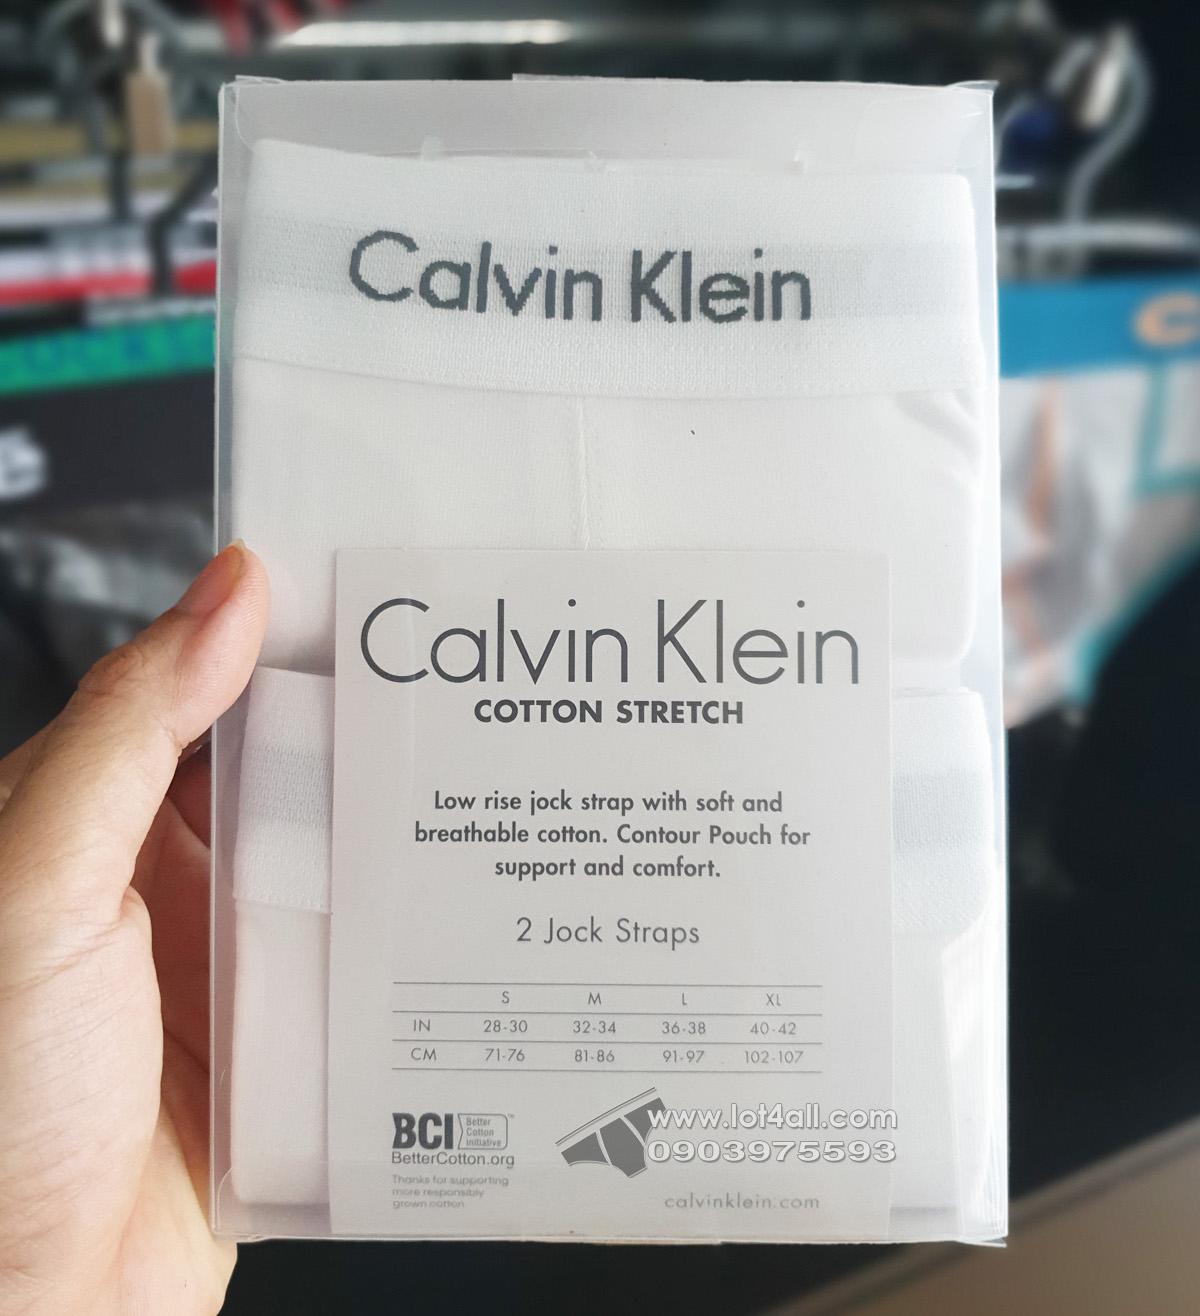 Quần lót nam Calvin Klein NB1354 Cotton Stretch Jockstrap 2-pack White